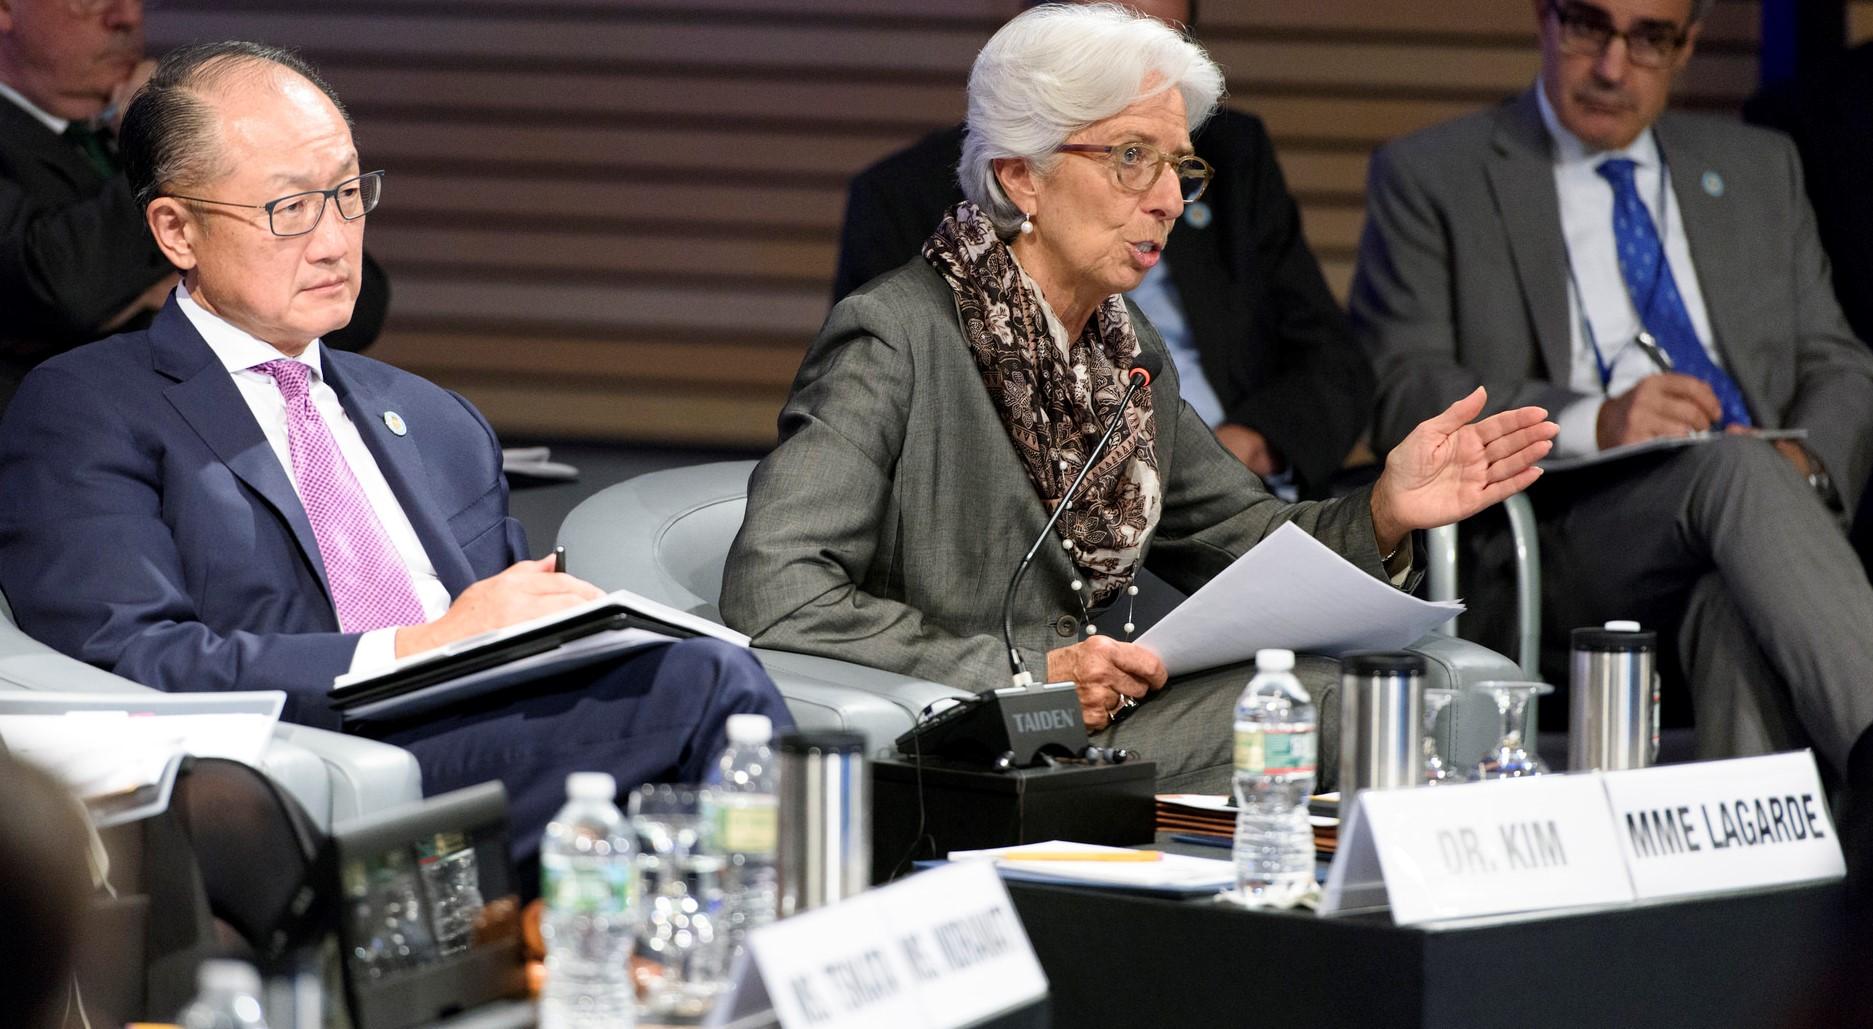 World Bank President Jim Yong Kim and IMF Managing Director Christine Lagarde, October 2017 (Photo: World Bank/Flickr)